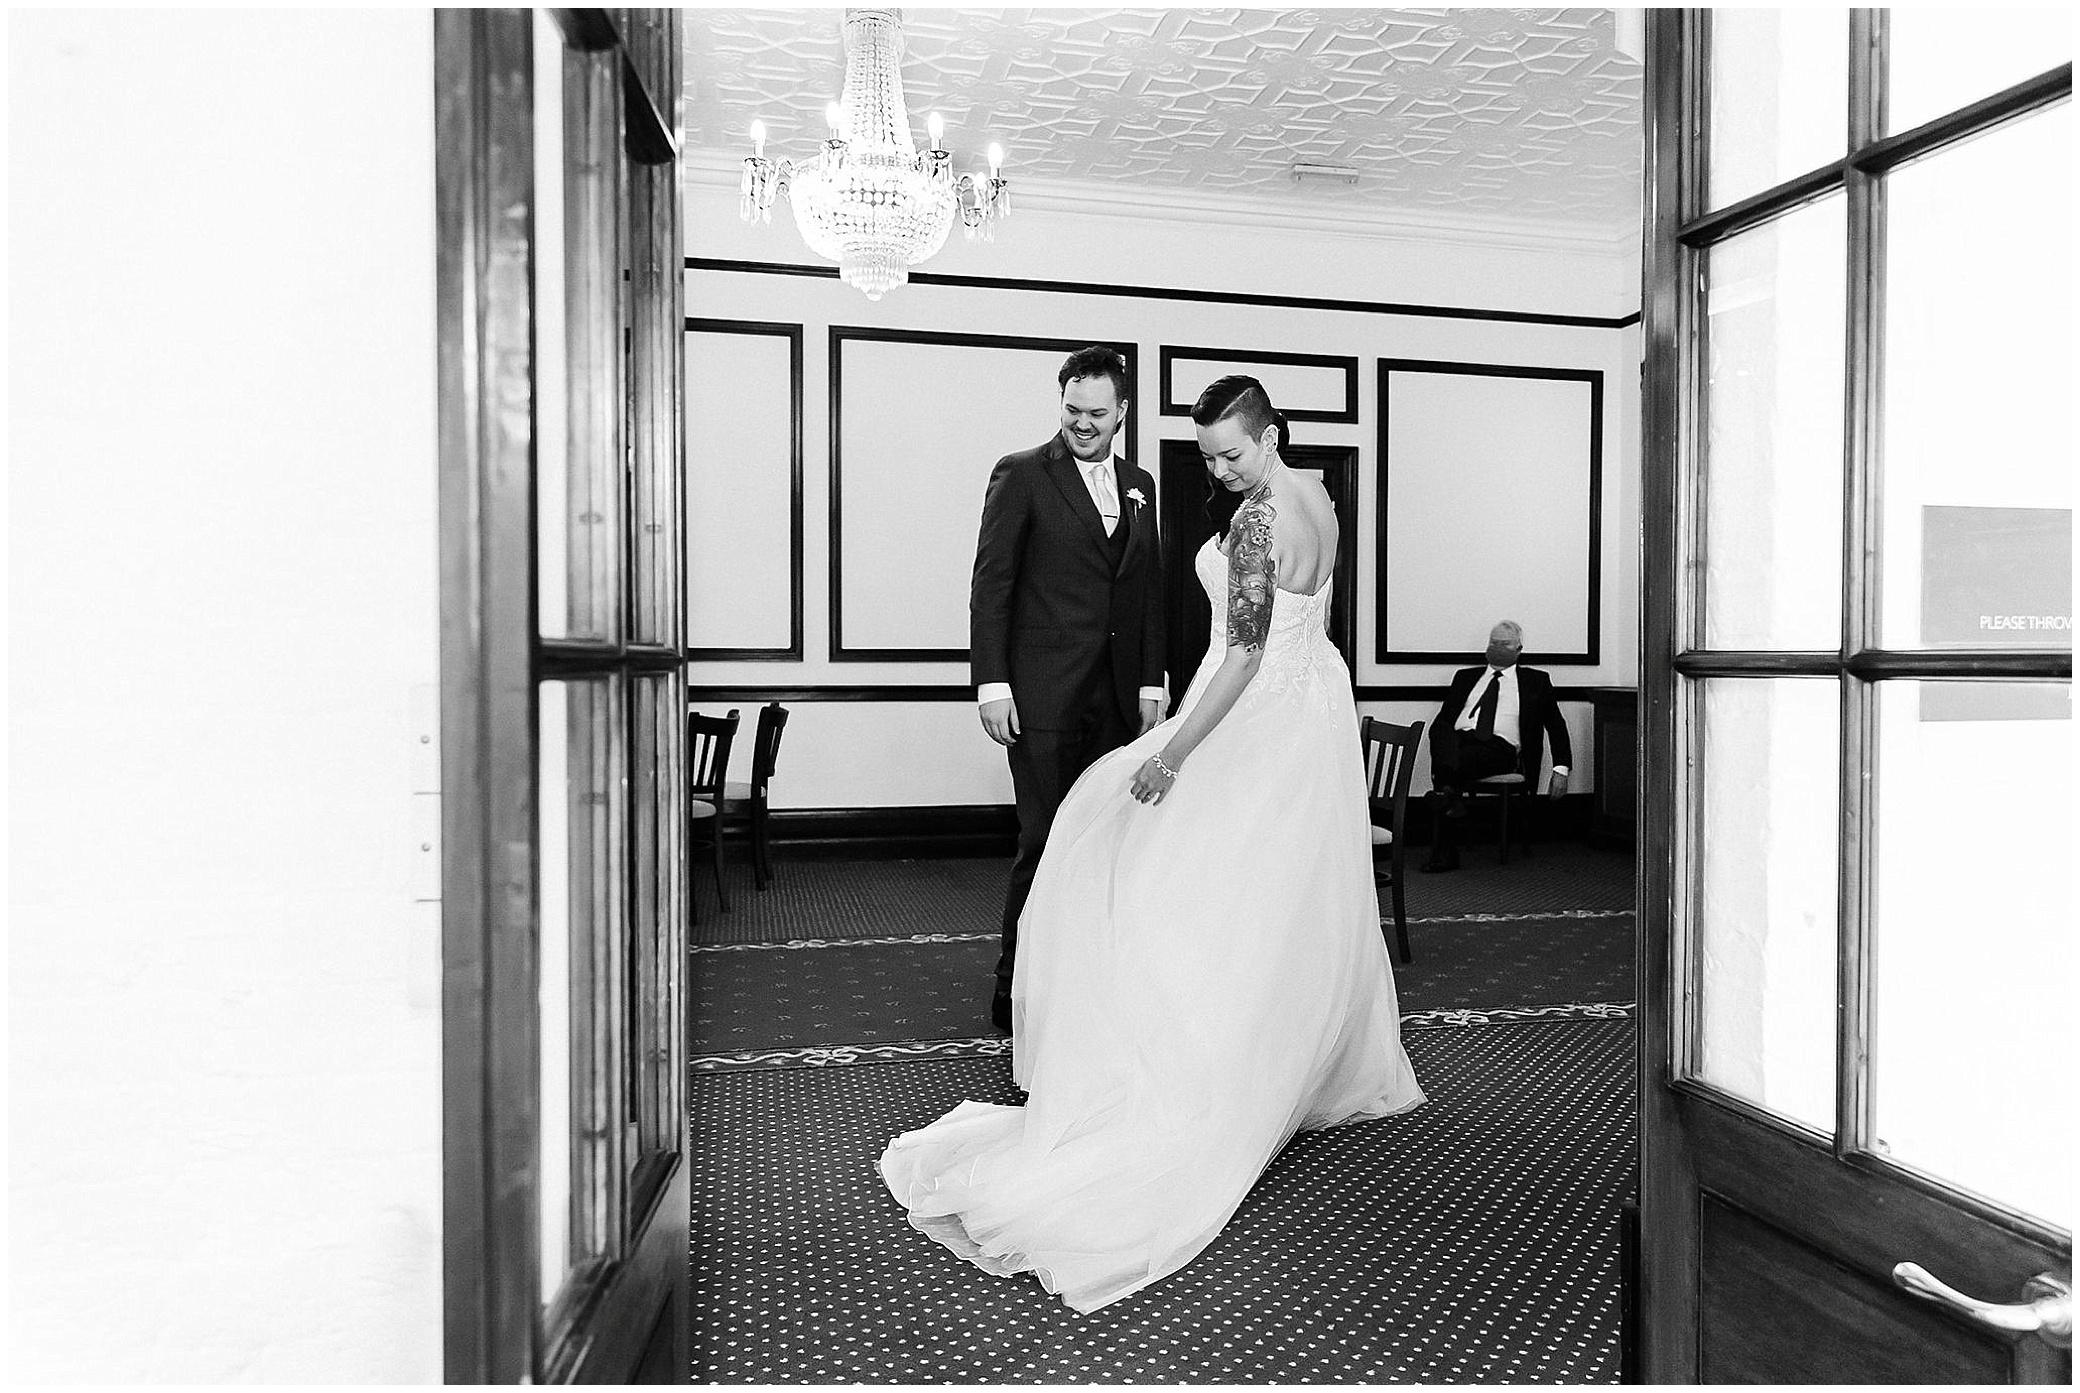 wedding ceremony at Leatherhead registry office